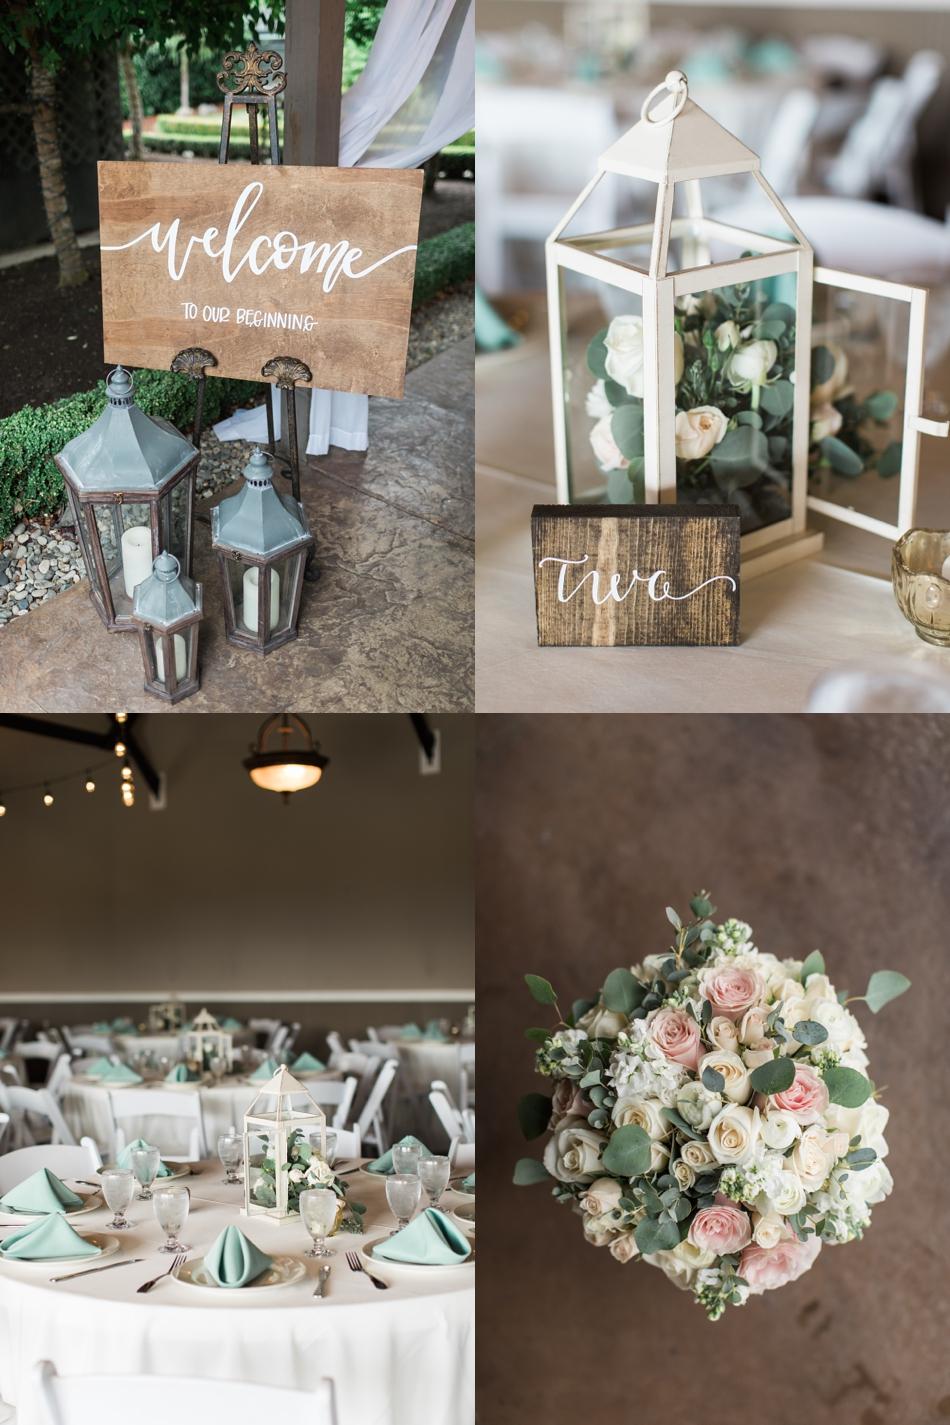 Photo of wedding decor at a Hidden Meadows Farms wedding in Snohomish, a rustic yet elegant wedding venue near Seattle.   Joanna Monger Photography